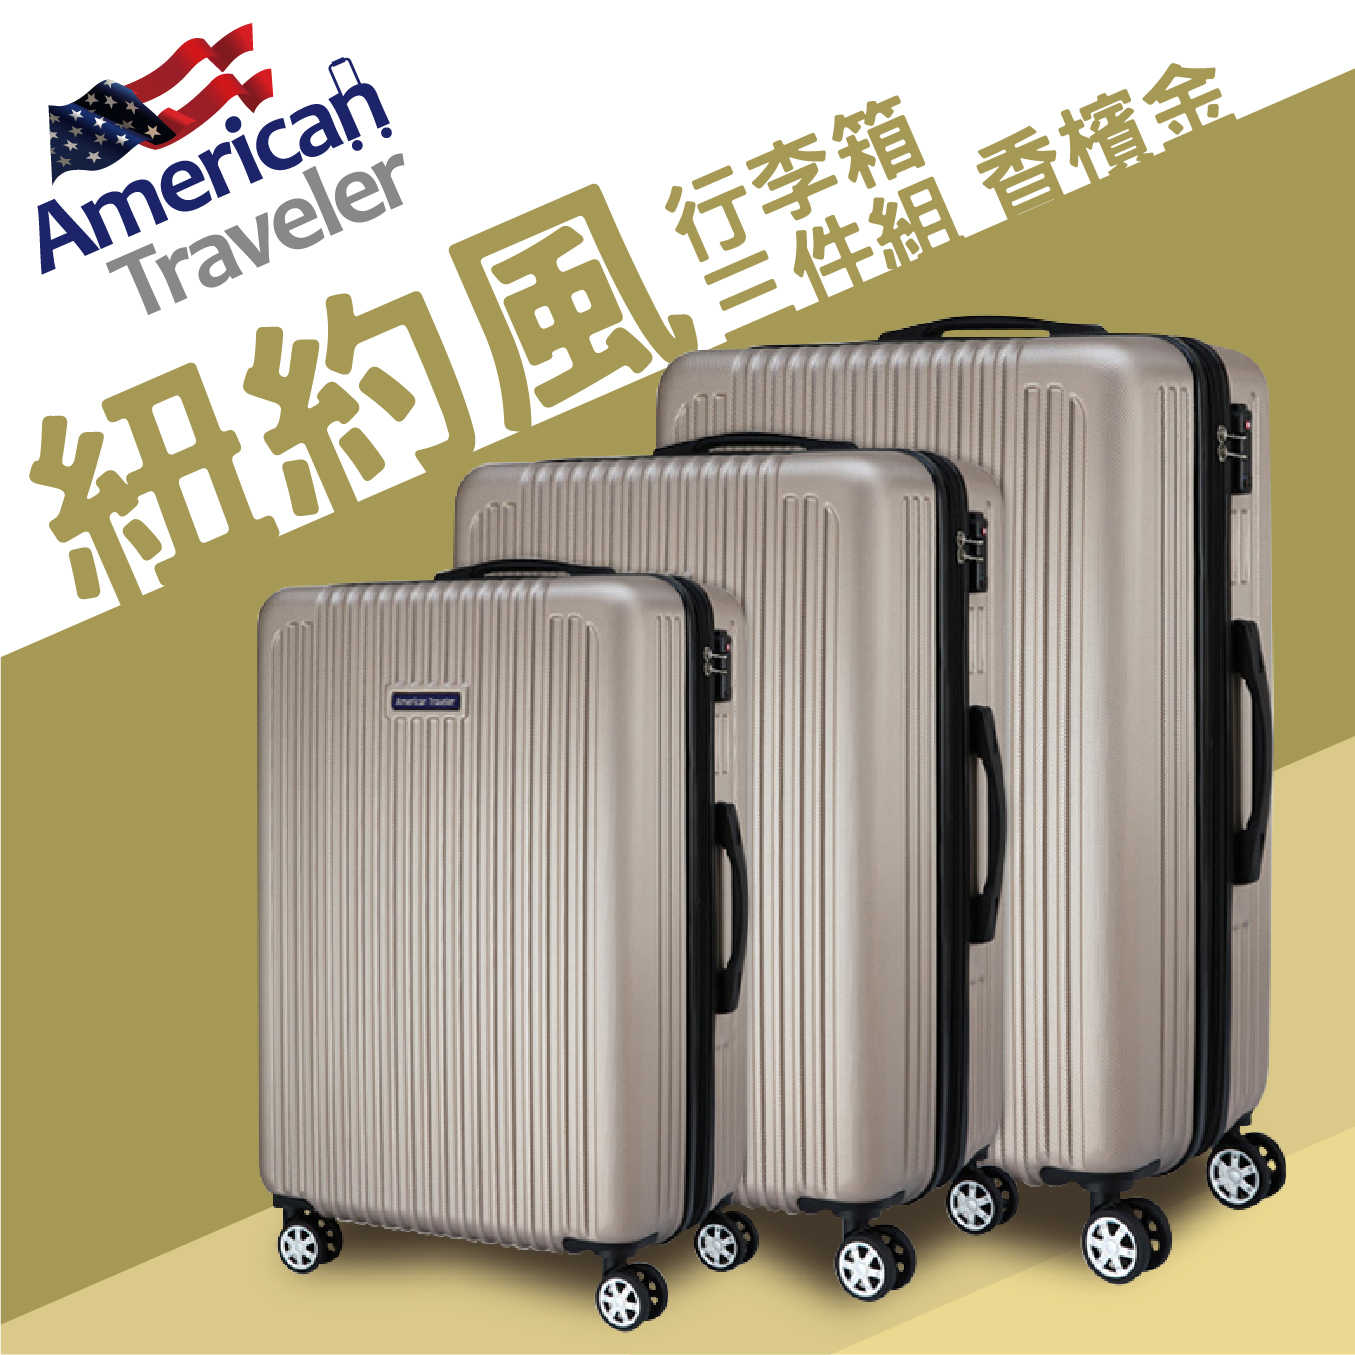 American Traveler紐約系列(20+24+28吋)抗刮超輕量三件組行李箱